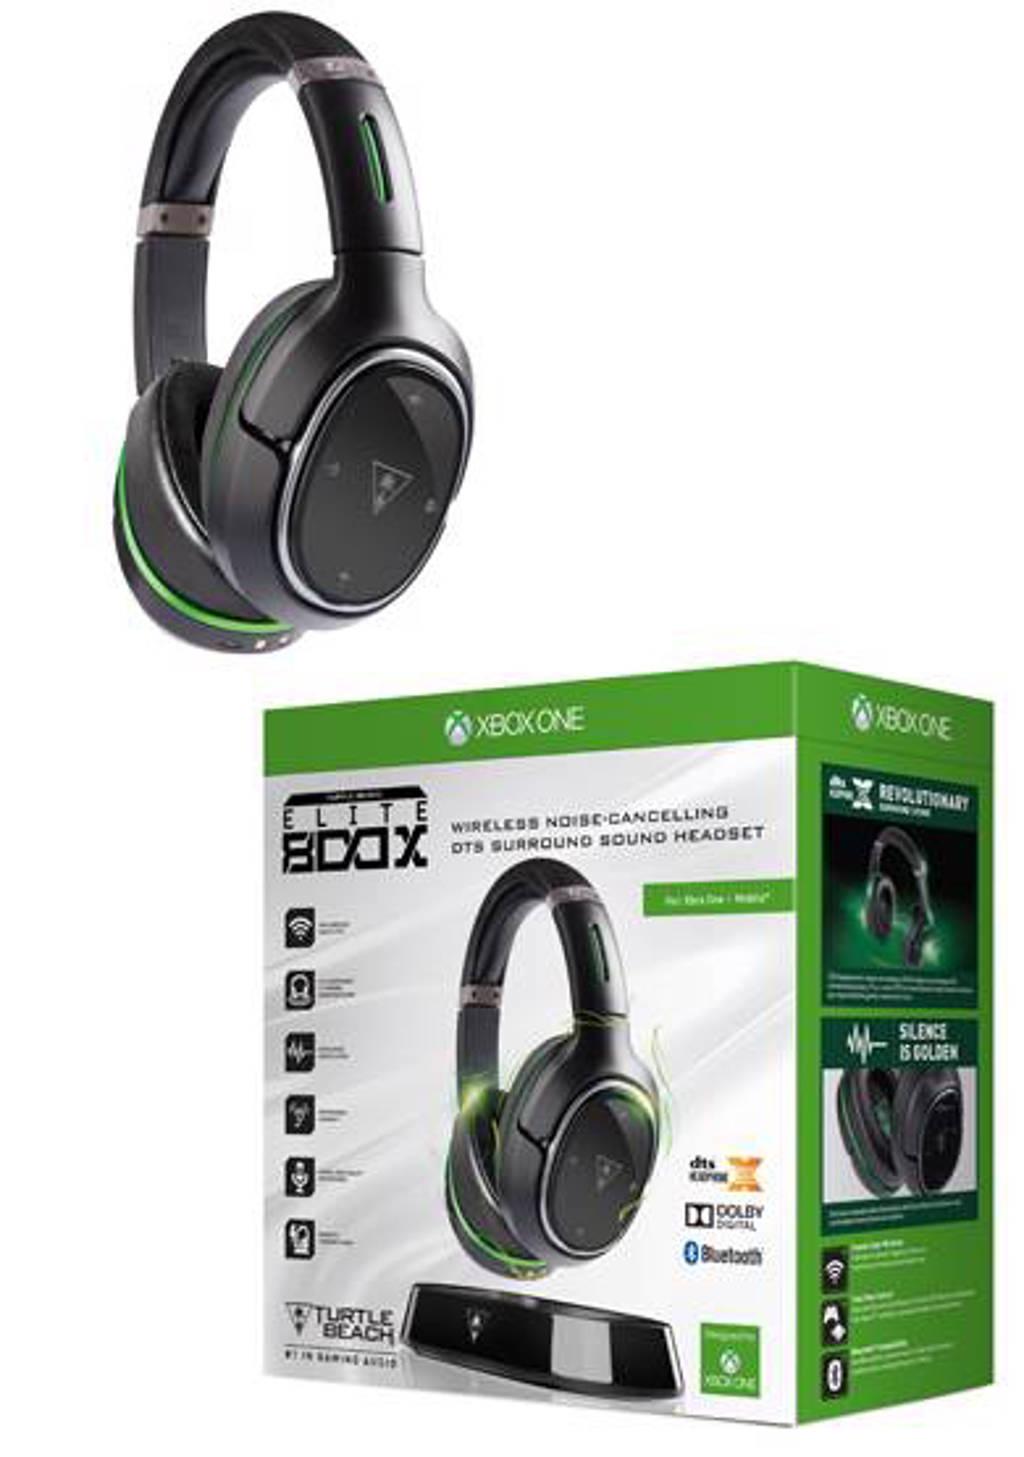 Earforce gaming headset Elite 800X (Turtle beach)